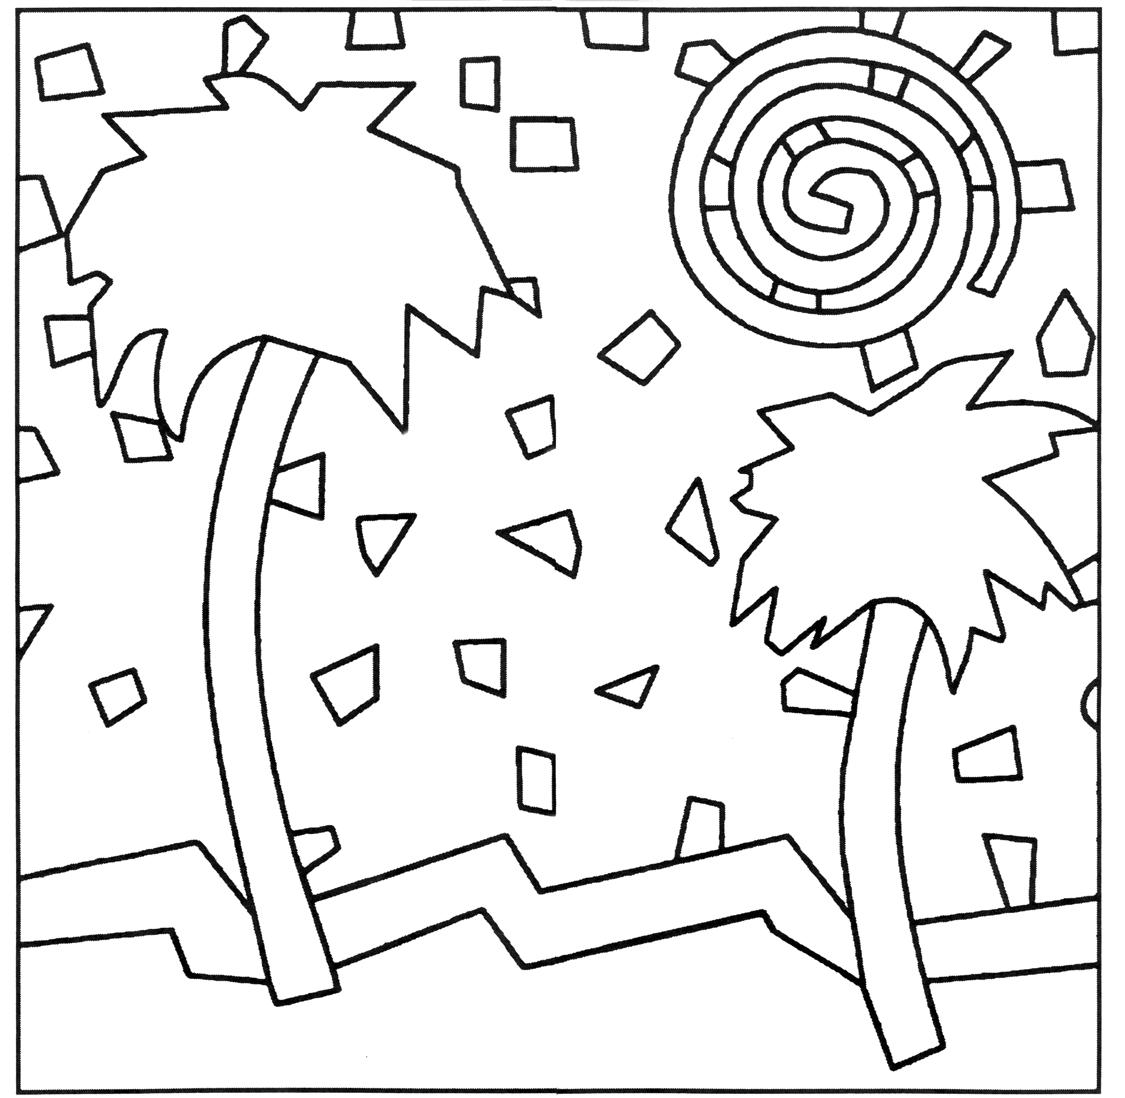 1125x1098 Free Mosaic Templates Kids Coloring